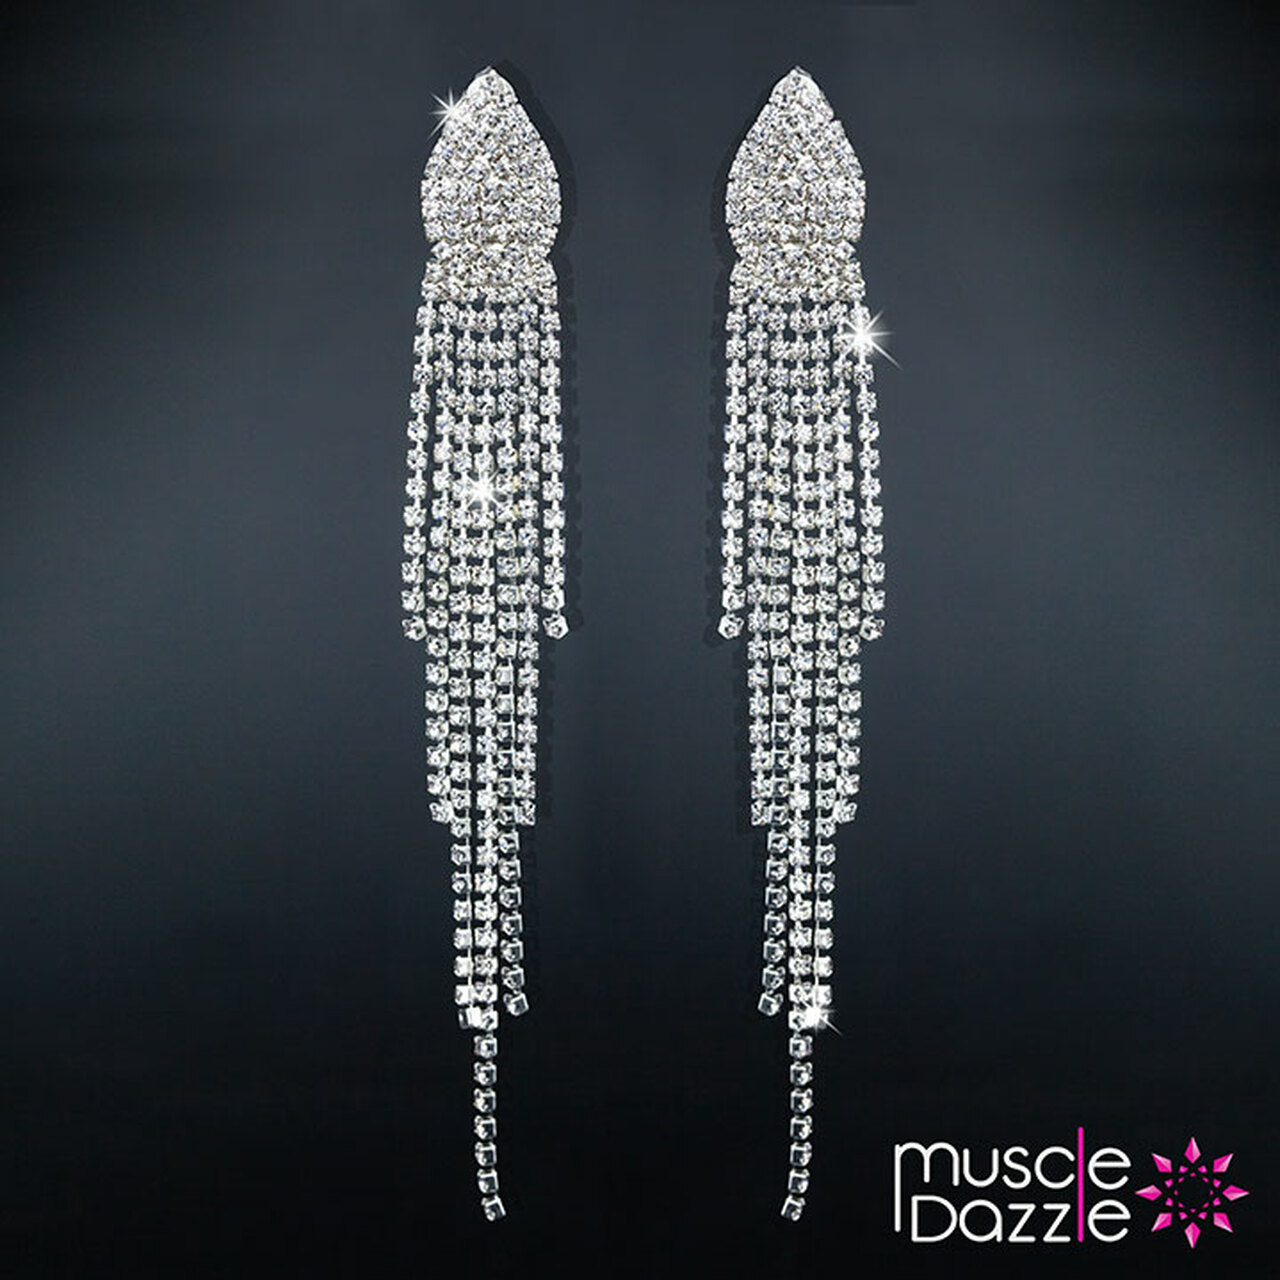 ea0c44011 Tassel Earrings | Crystal Bikini Competition Stage Jewelry